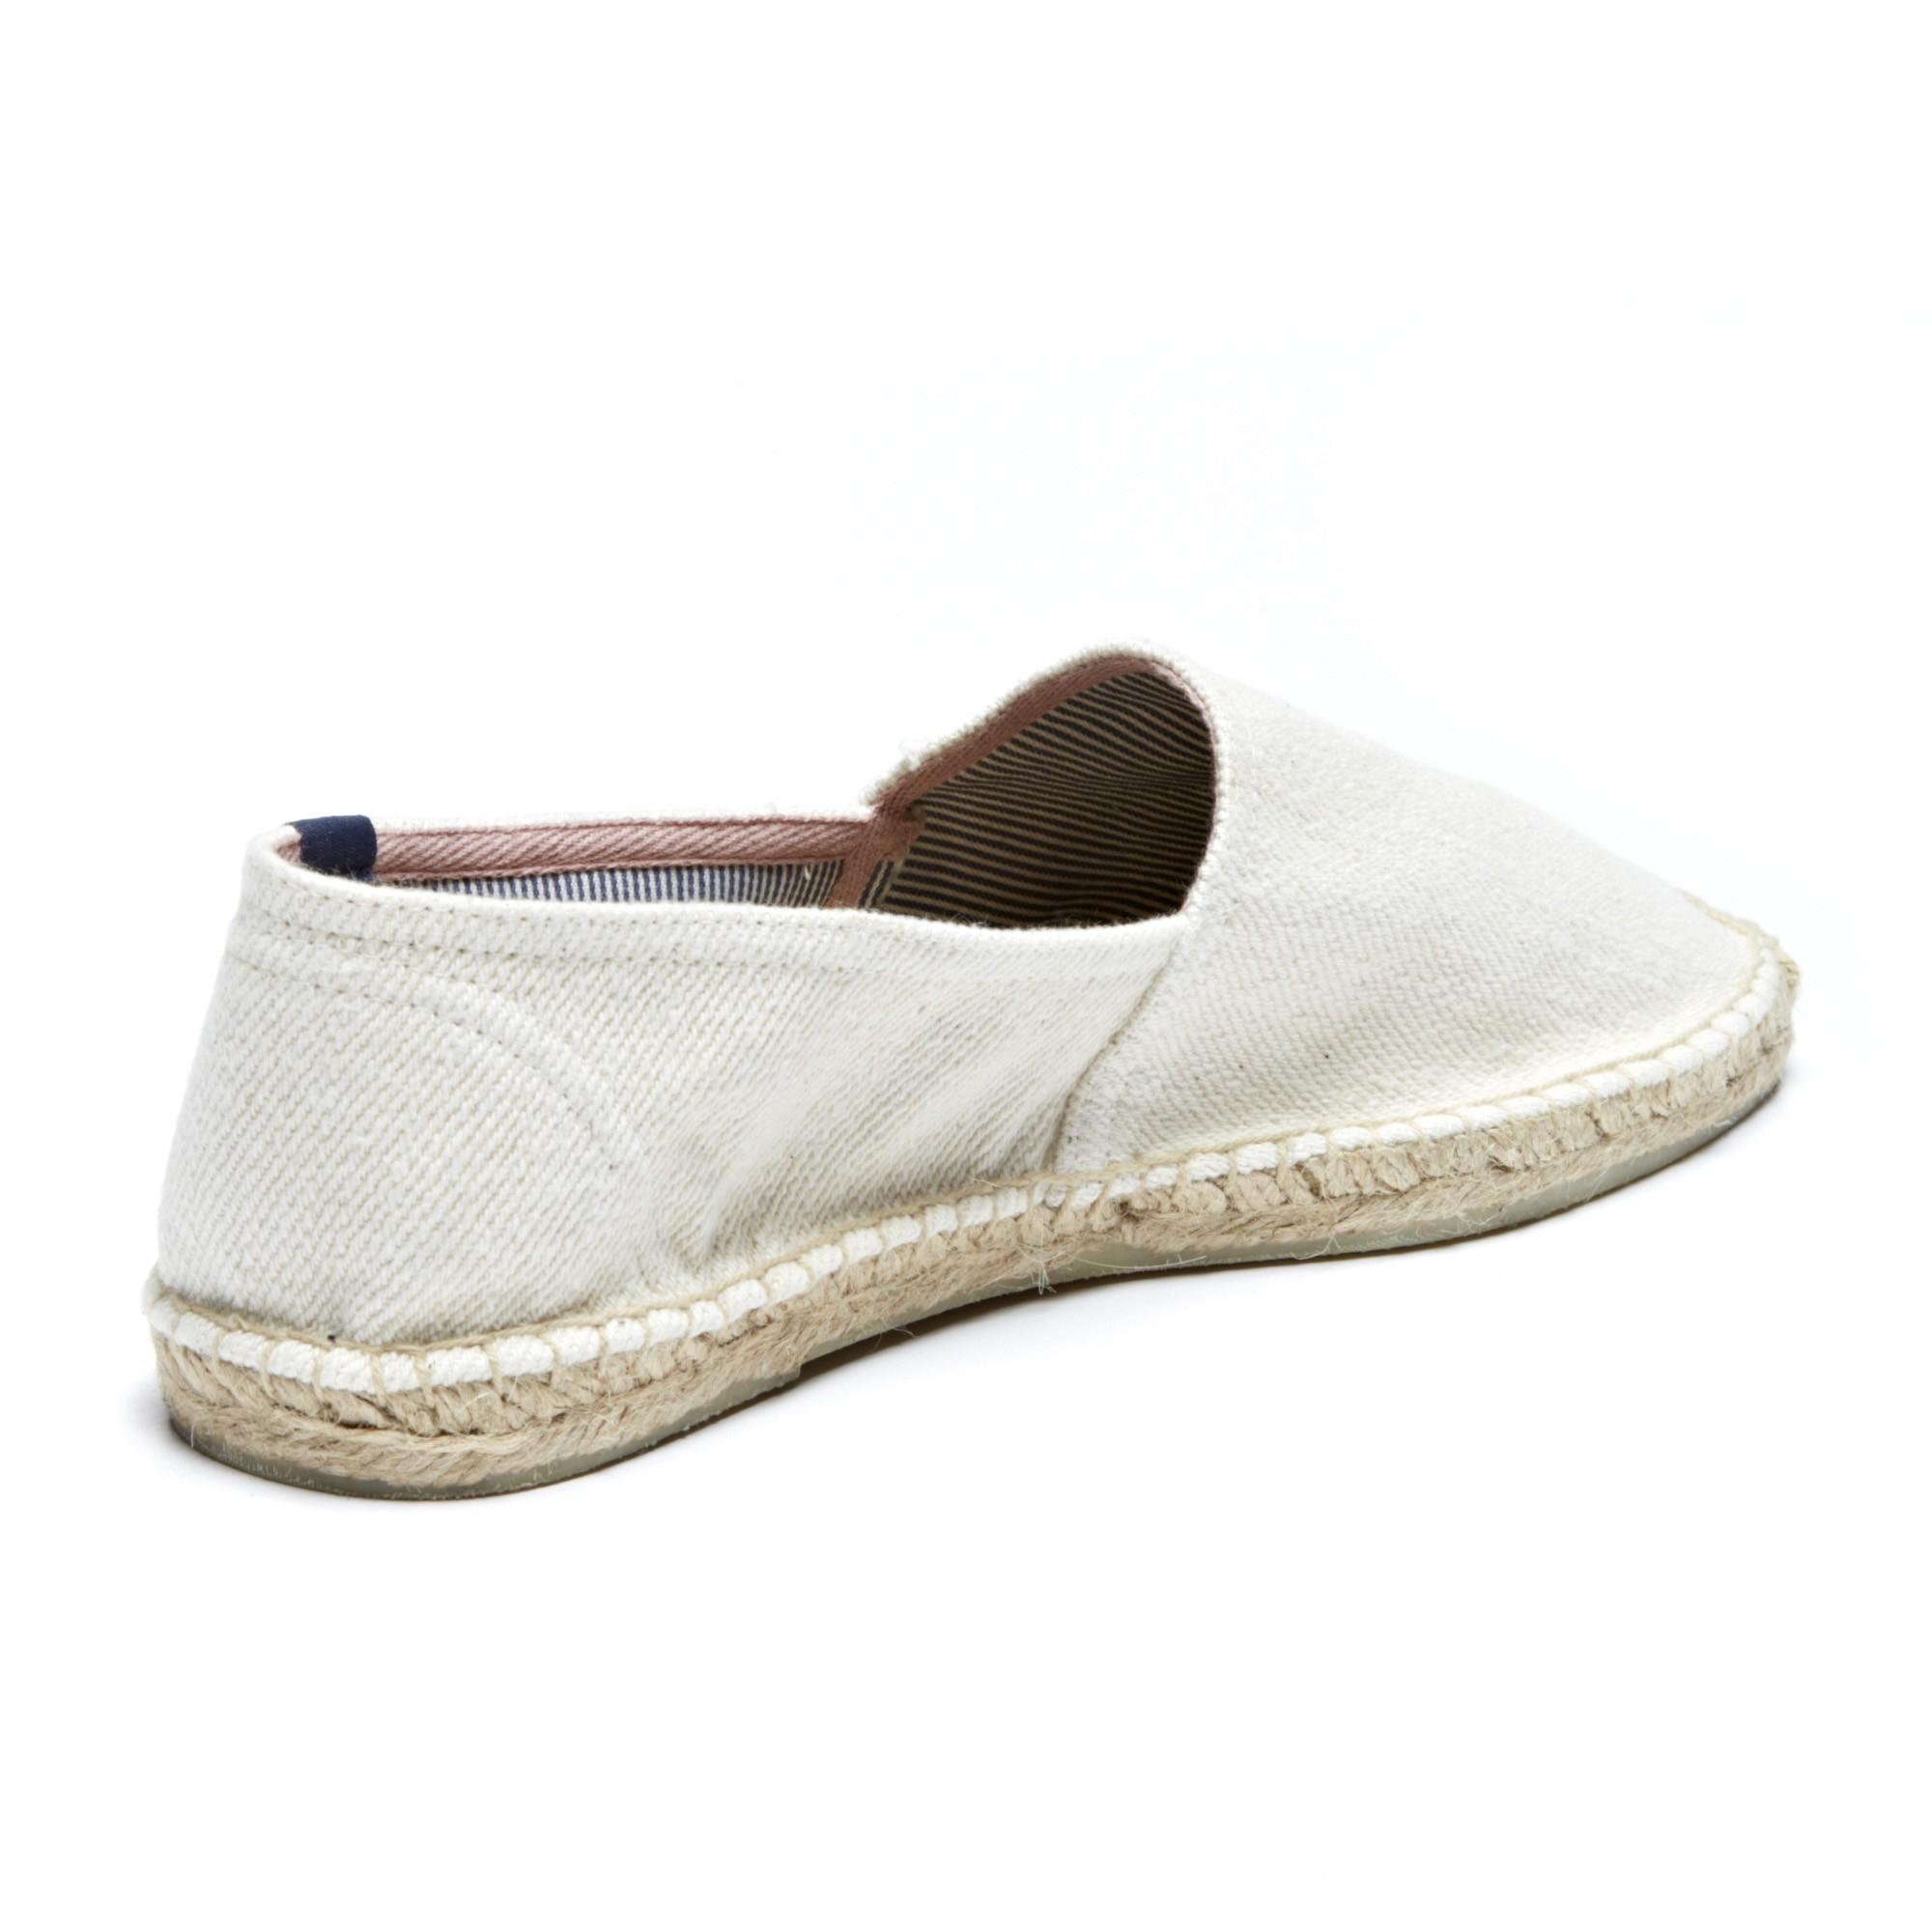 Dkny Mens Slip On Shoes